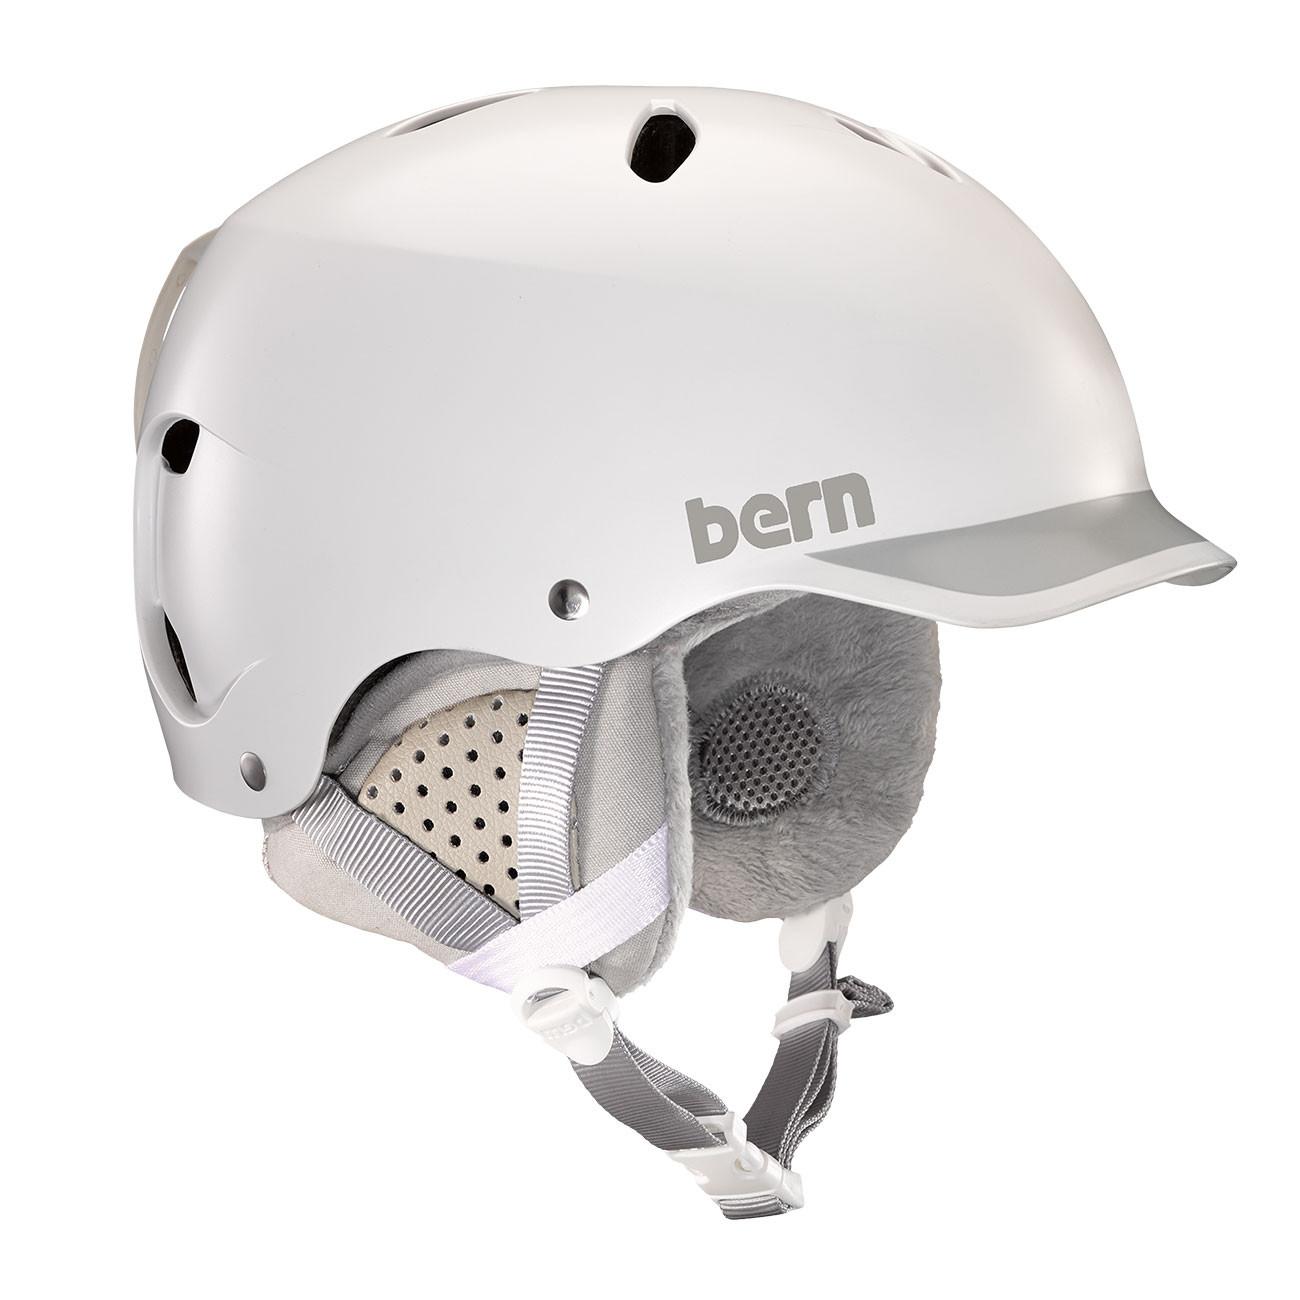 Helma Bern Lenox satin white/grey - M/L